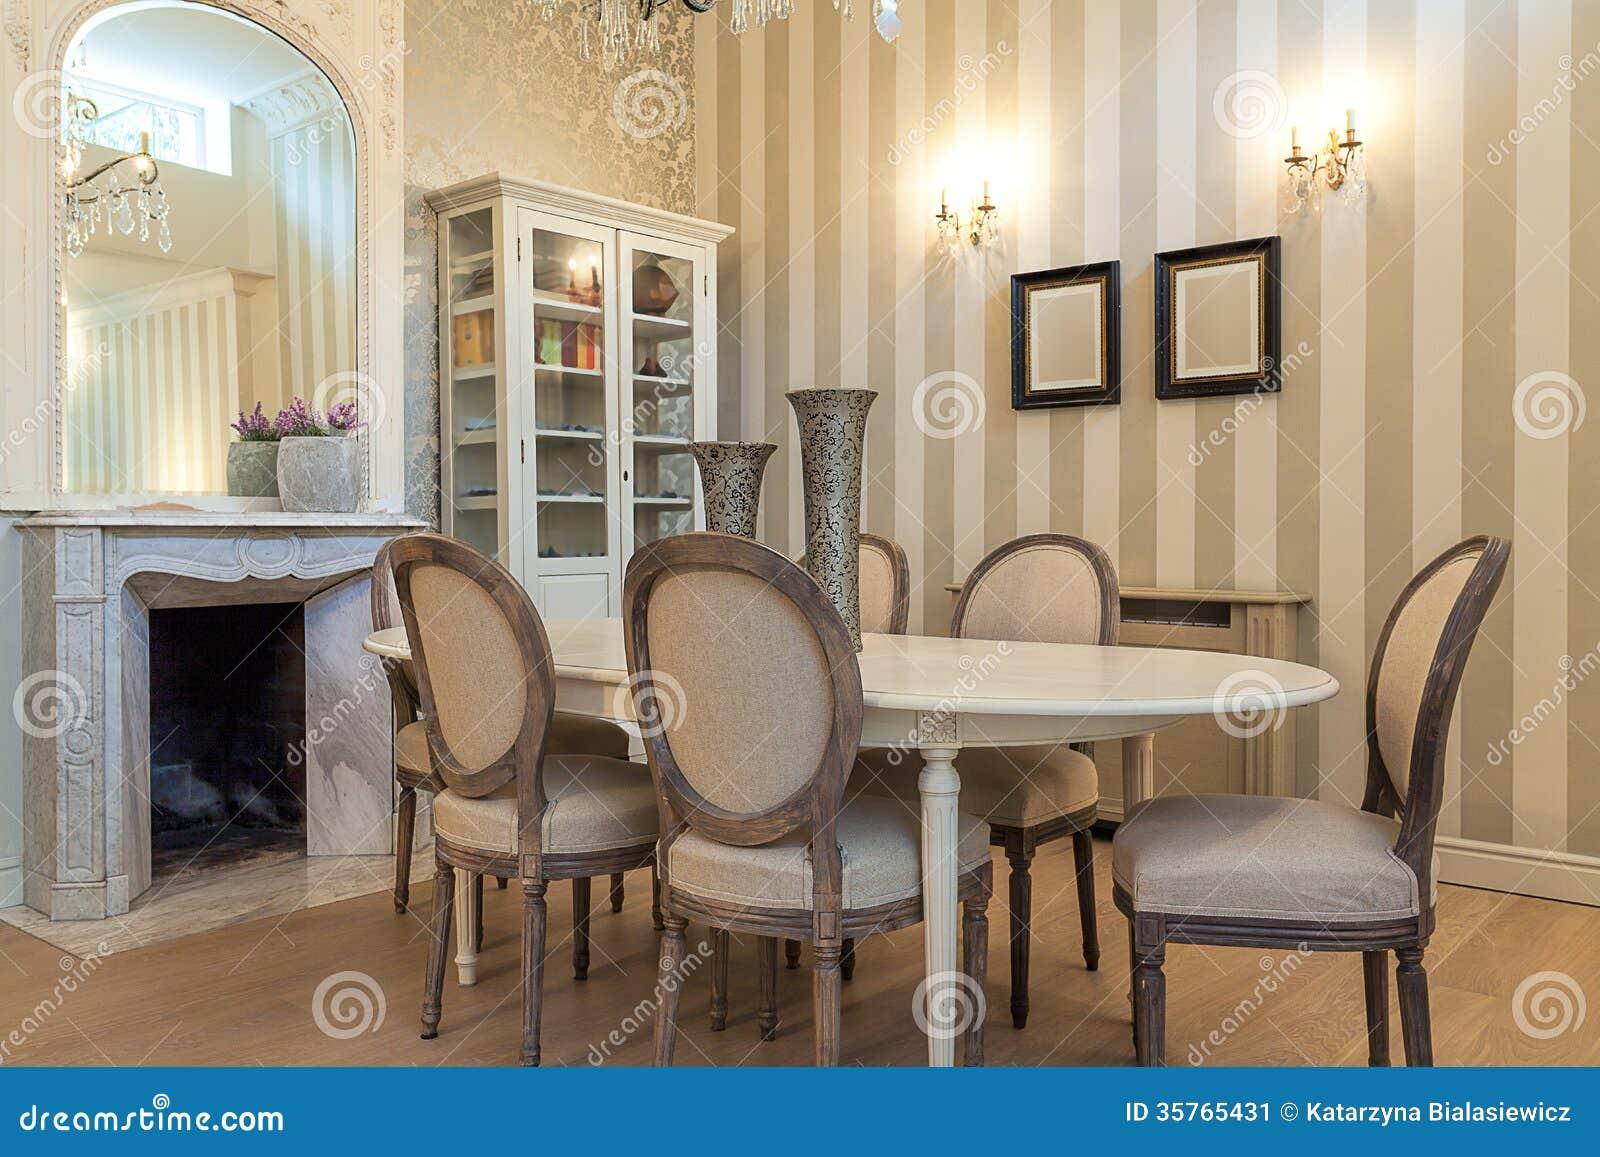 Vintage Mansion   Dining Table